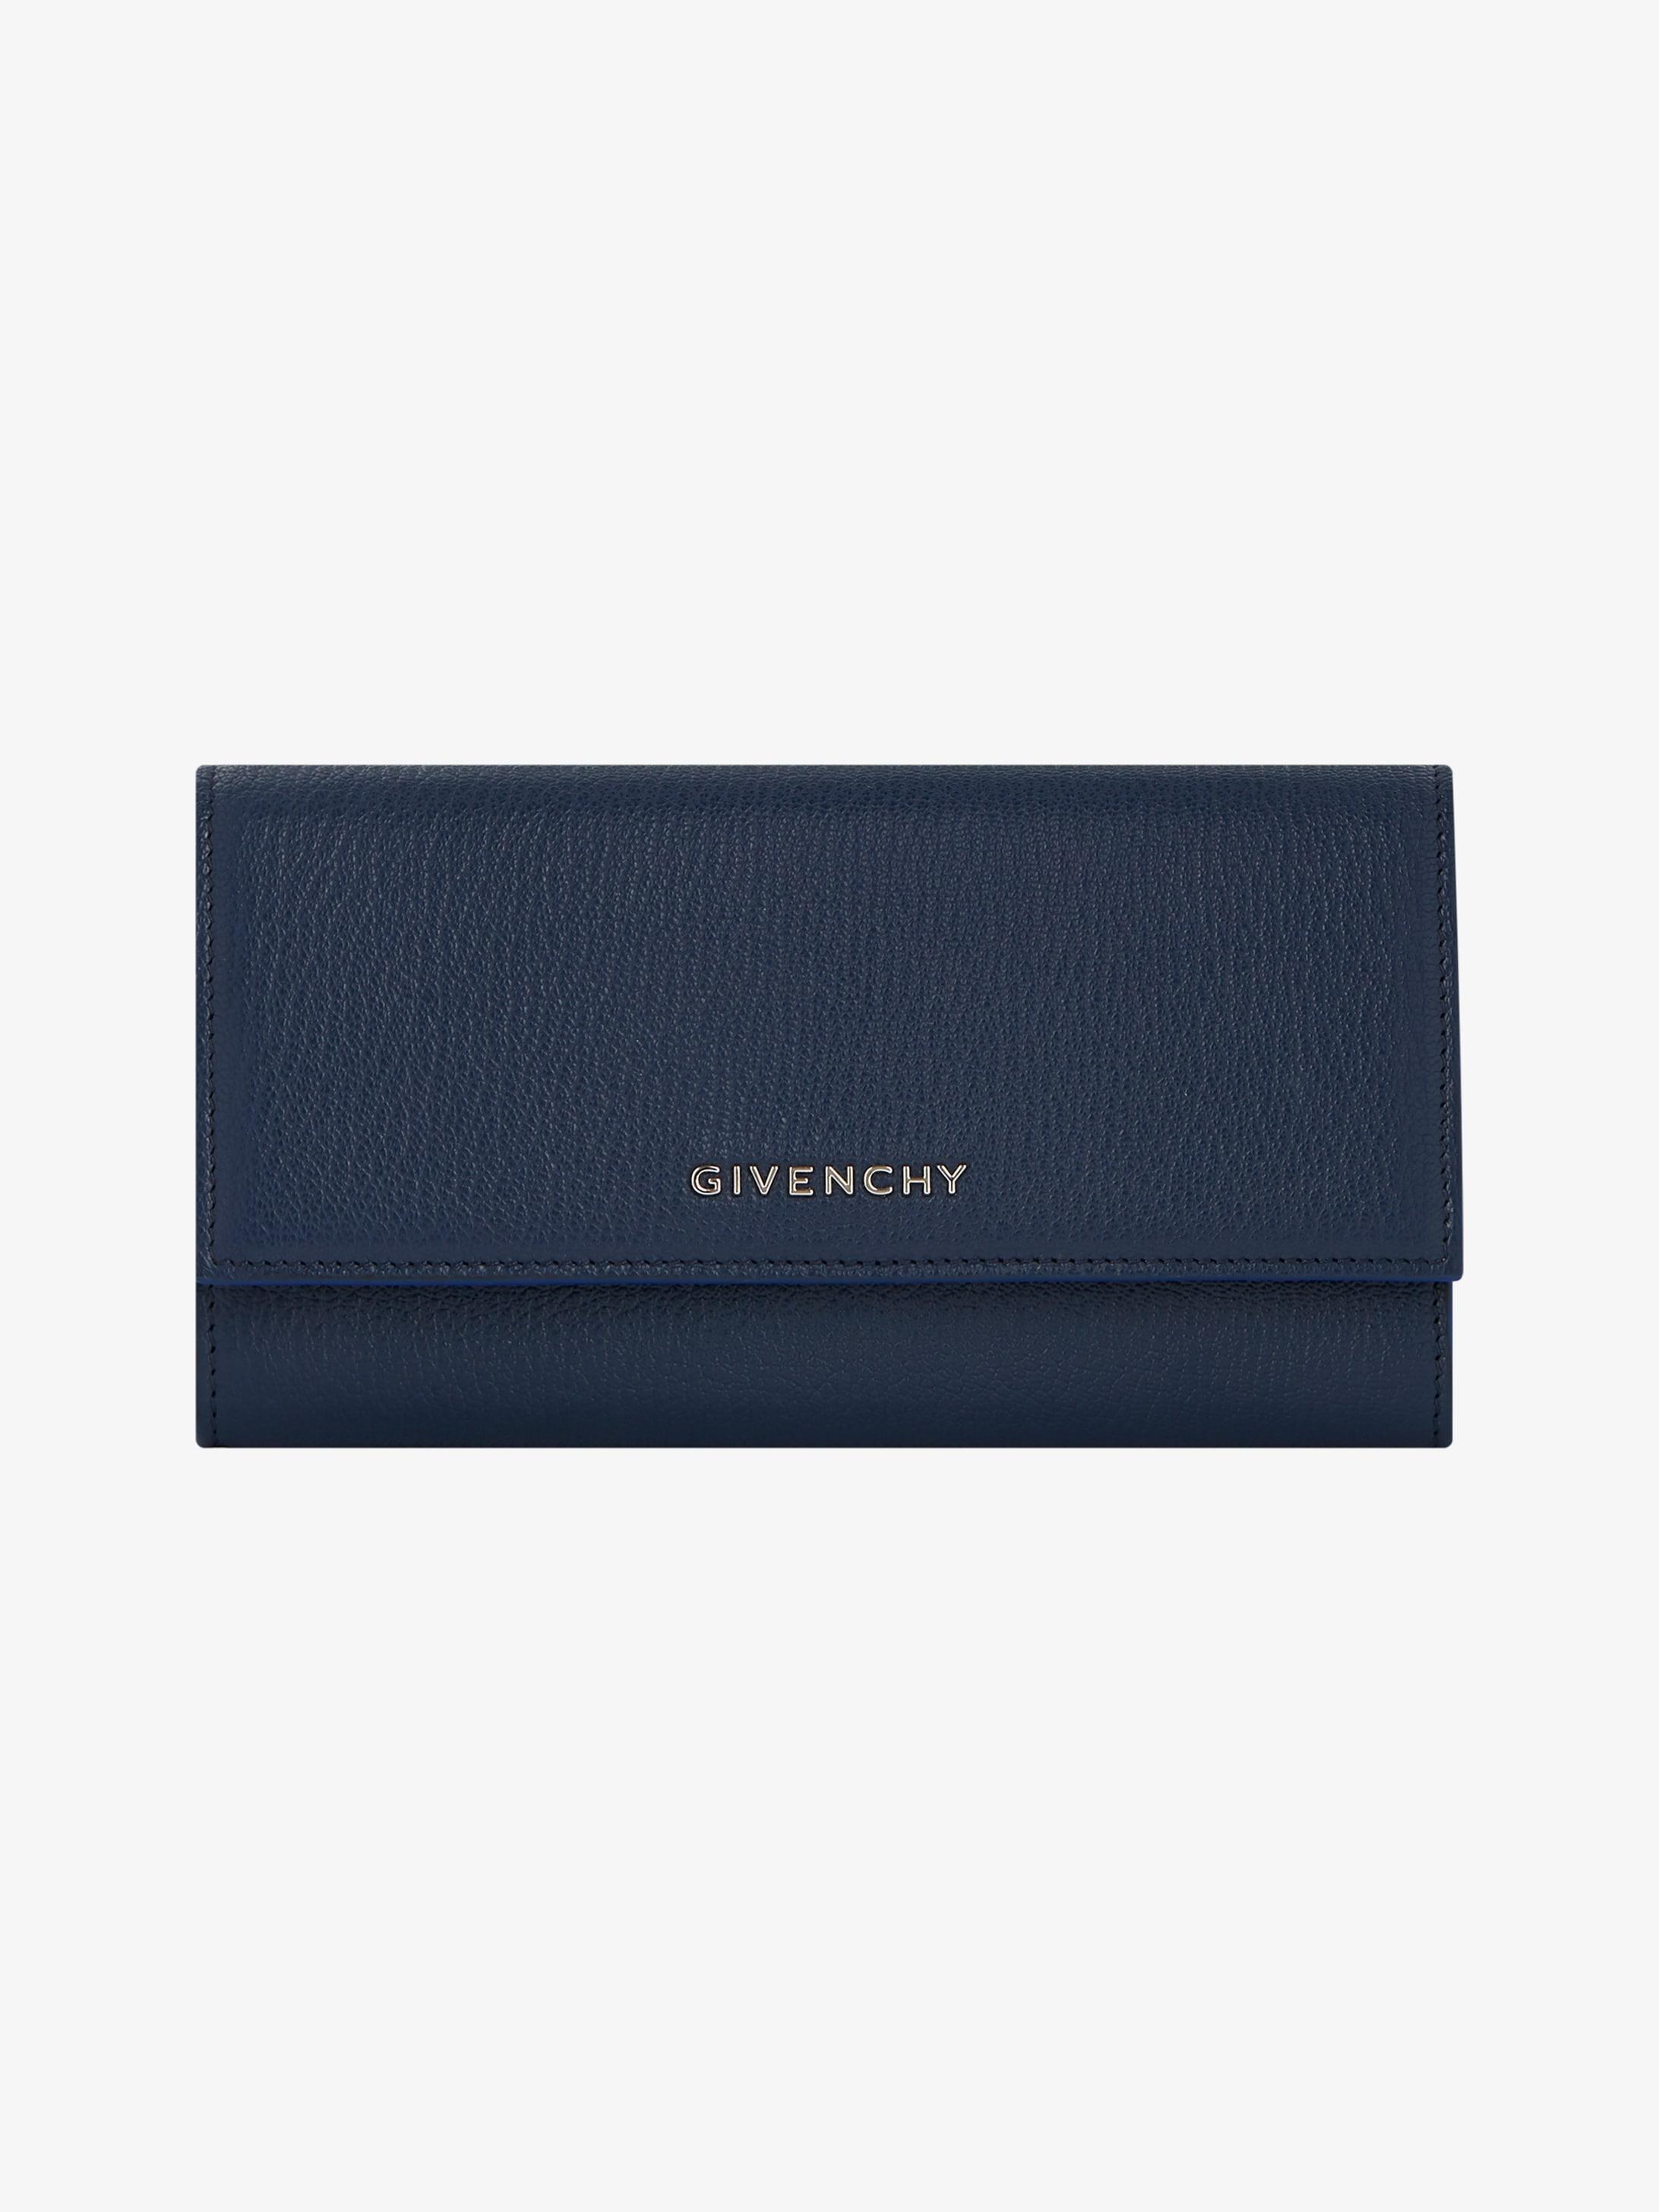 Pandora long flap wallet in leather